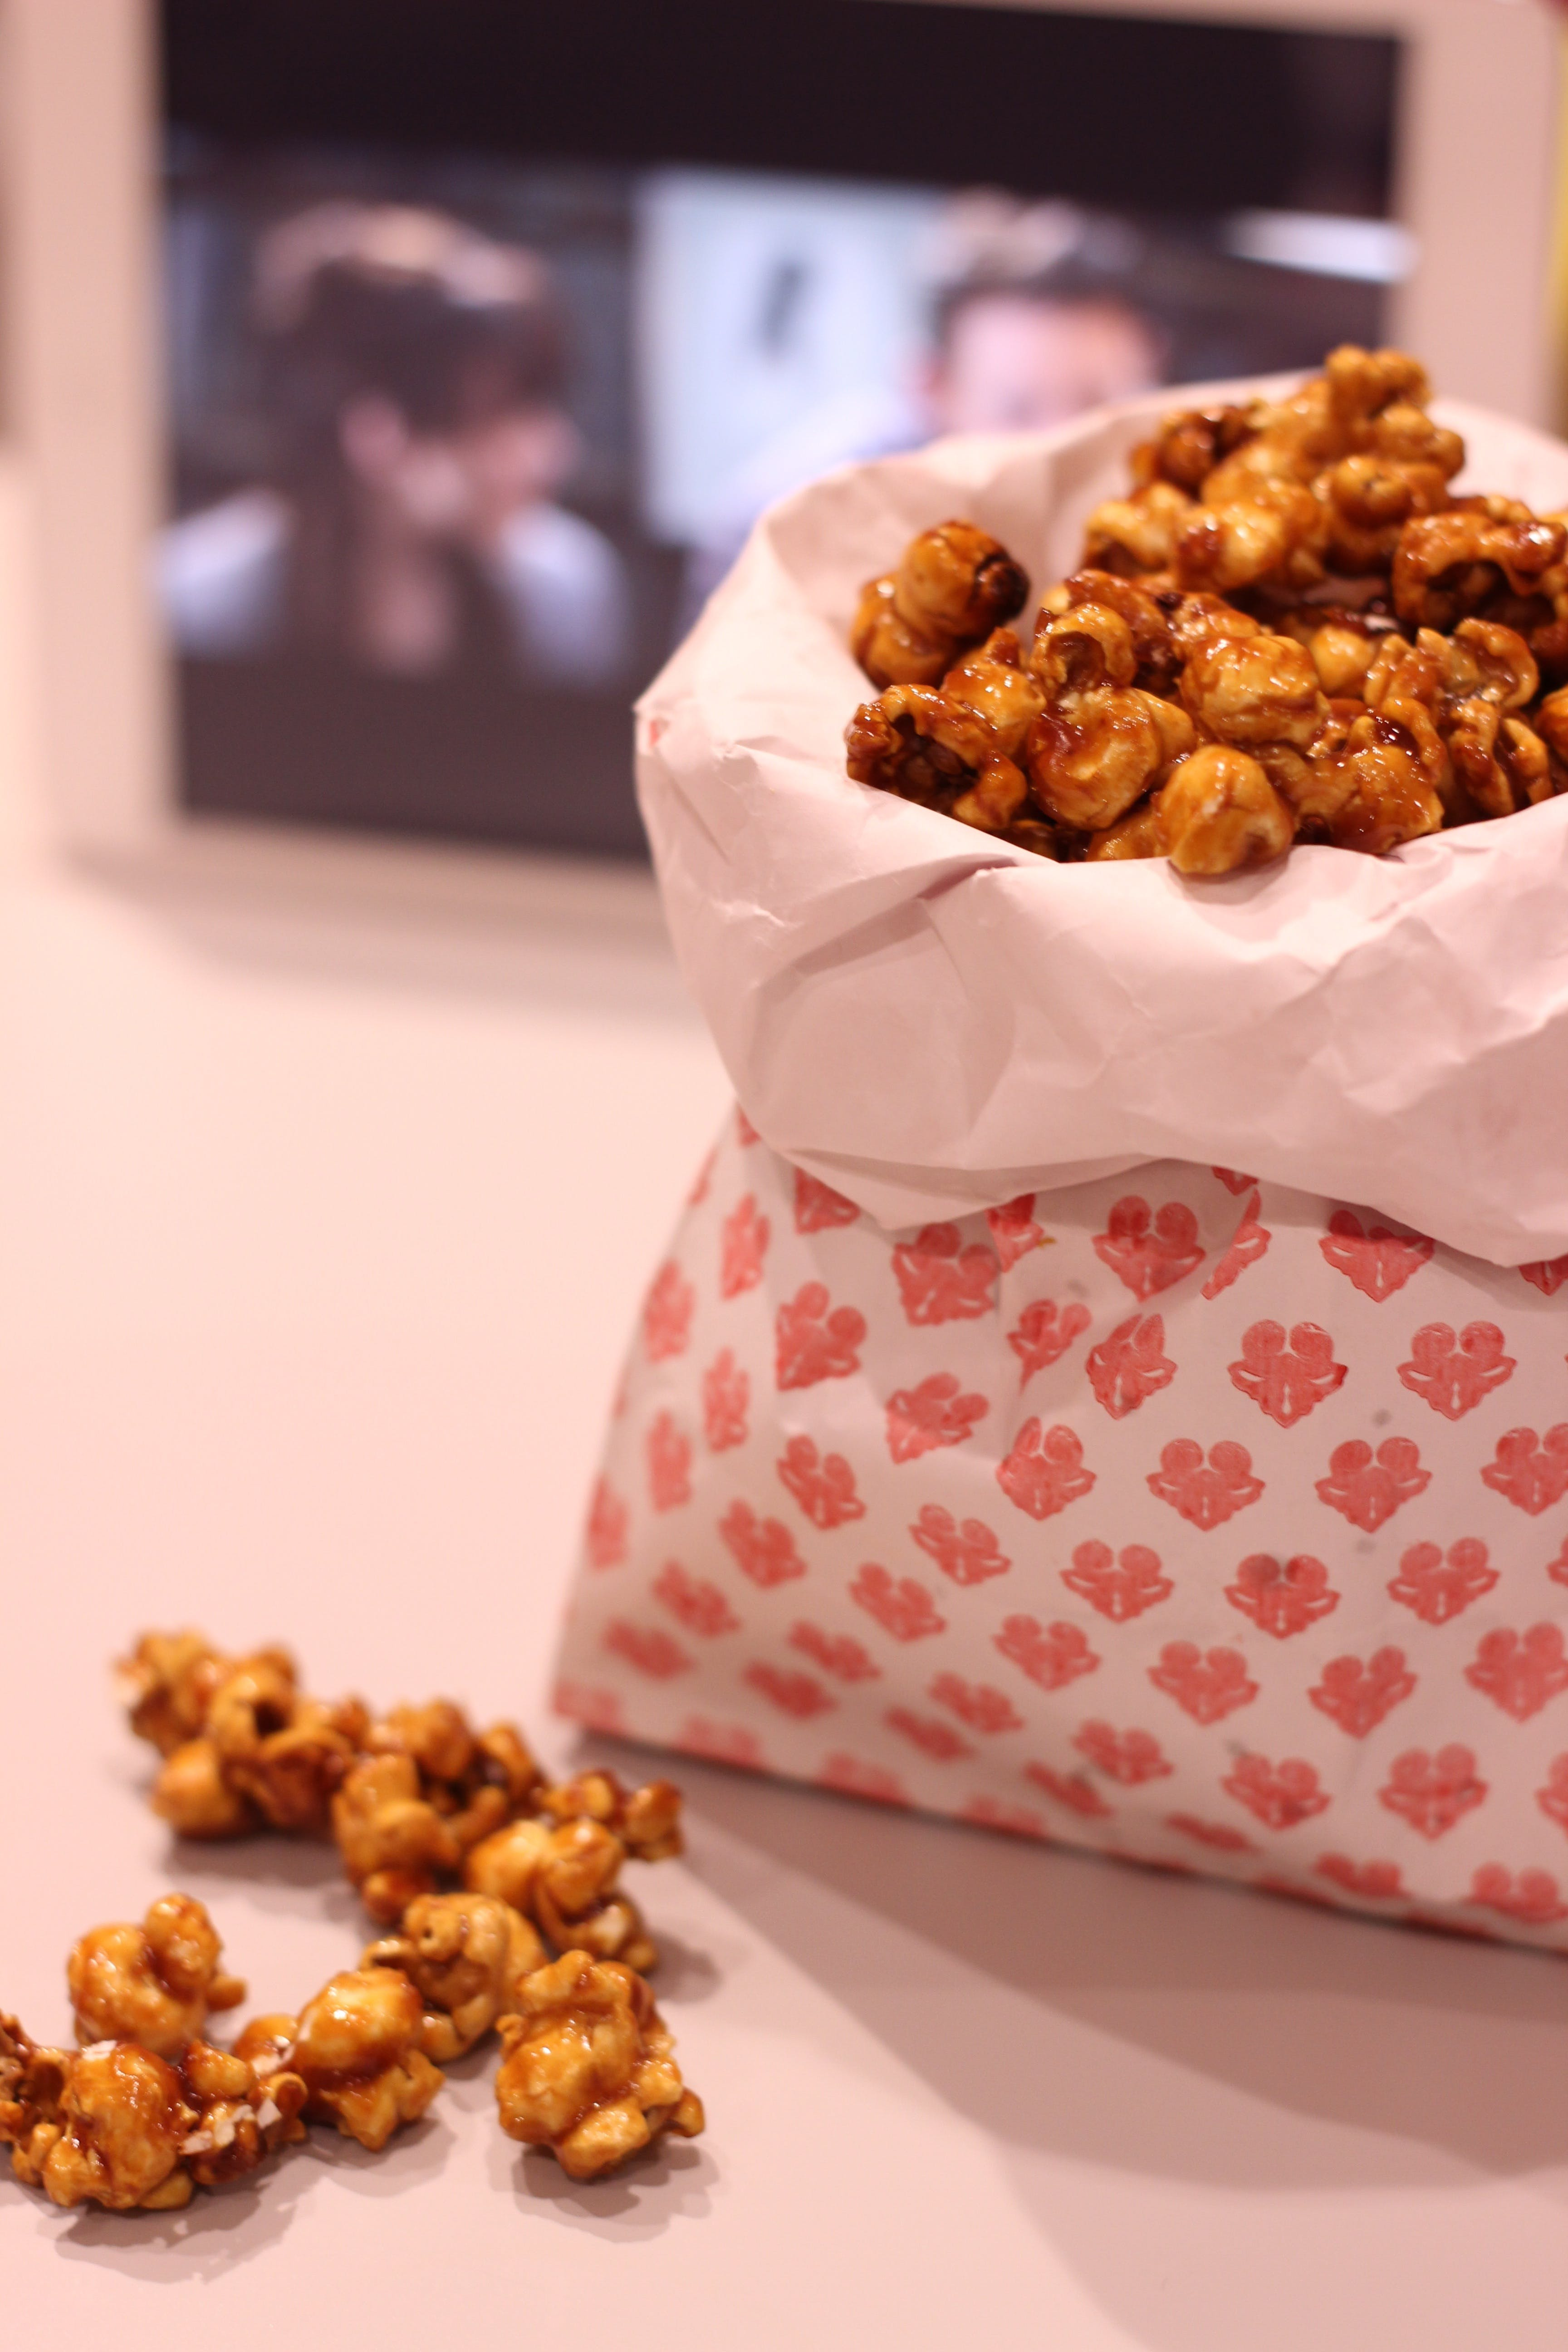 Popcorn Near White Smartphone